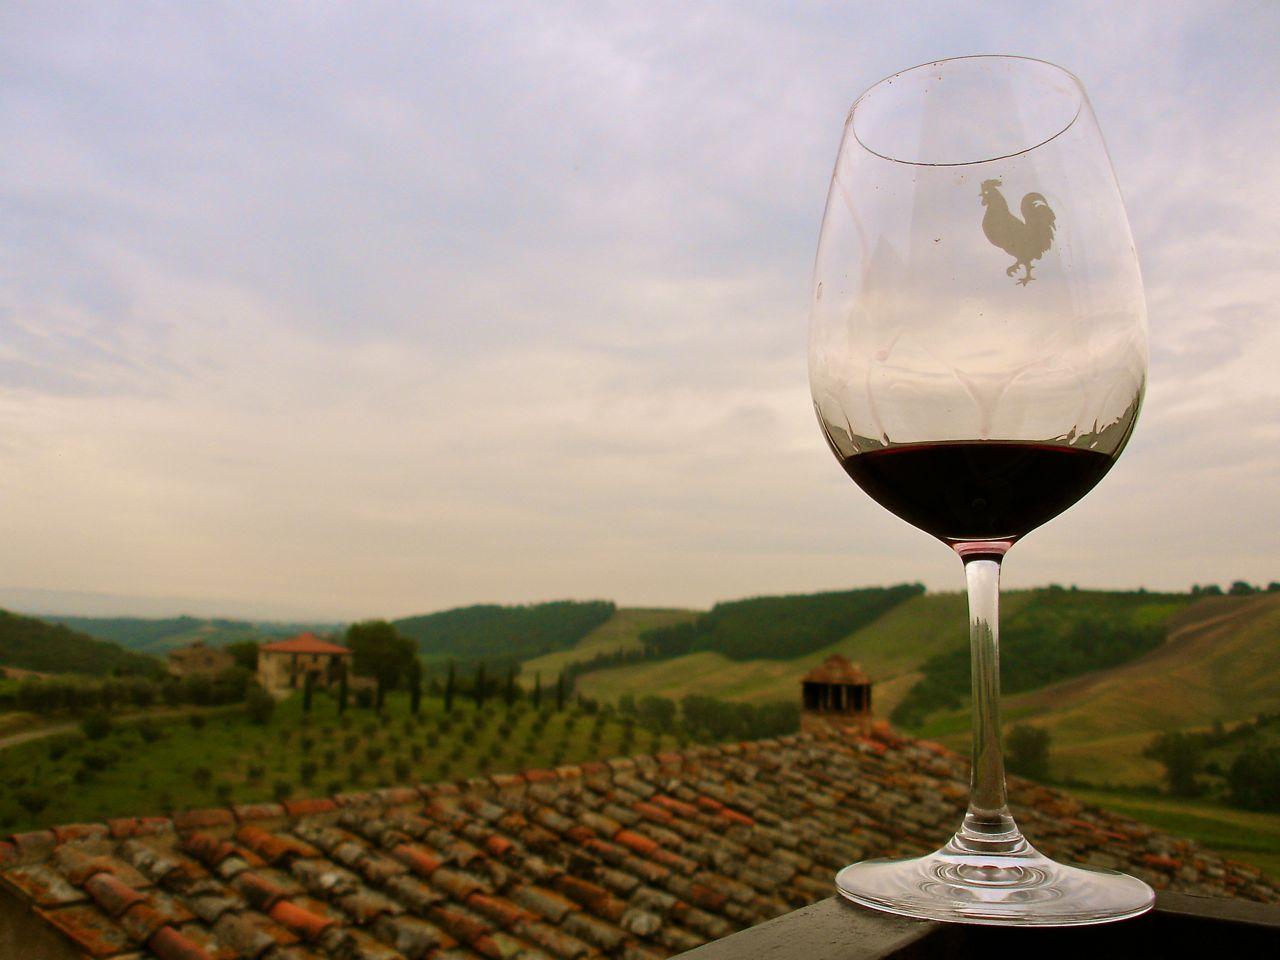 tuscany wine1 1024x768